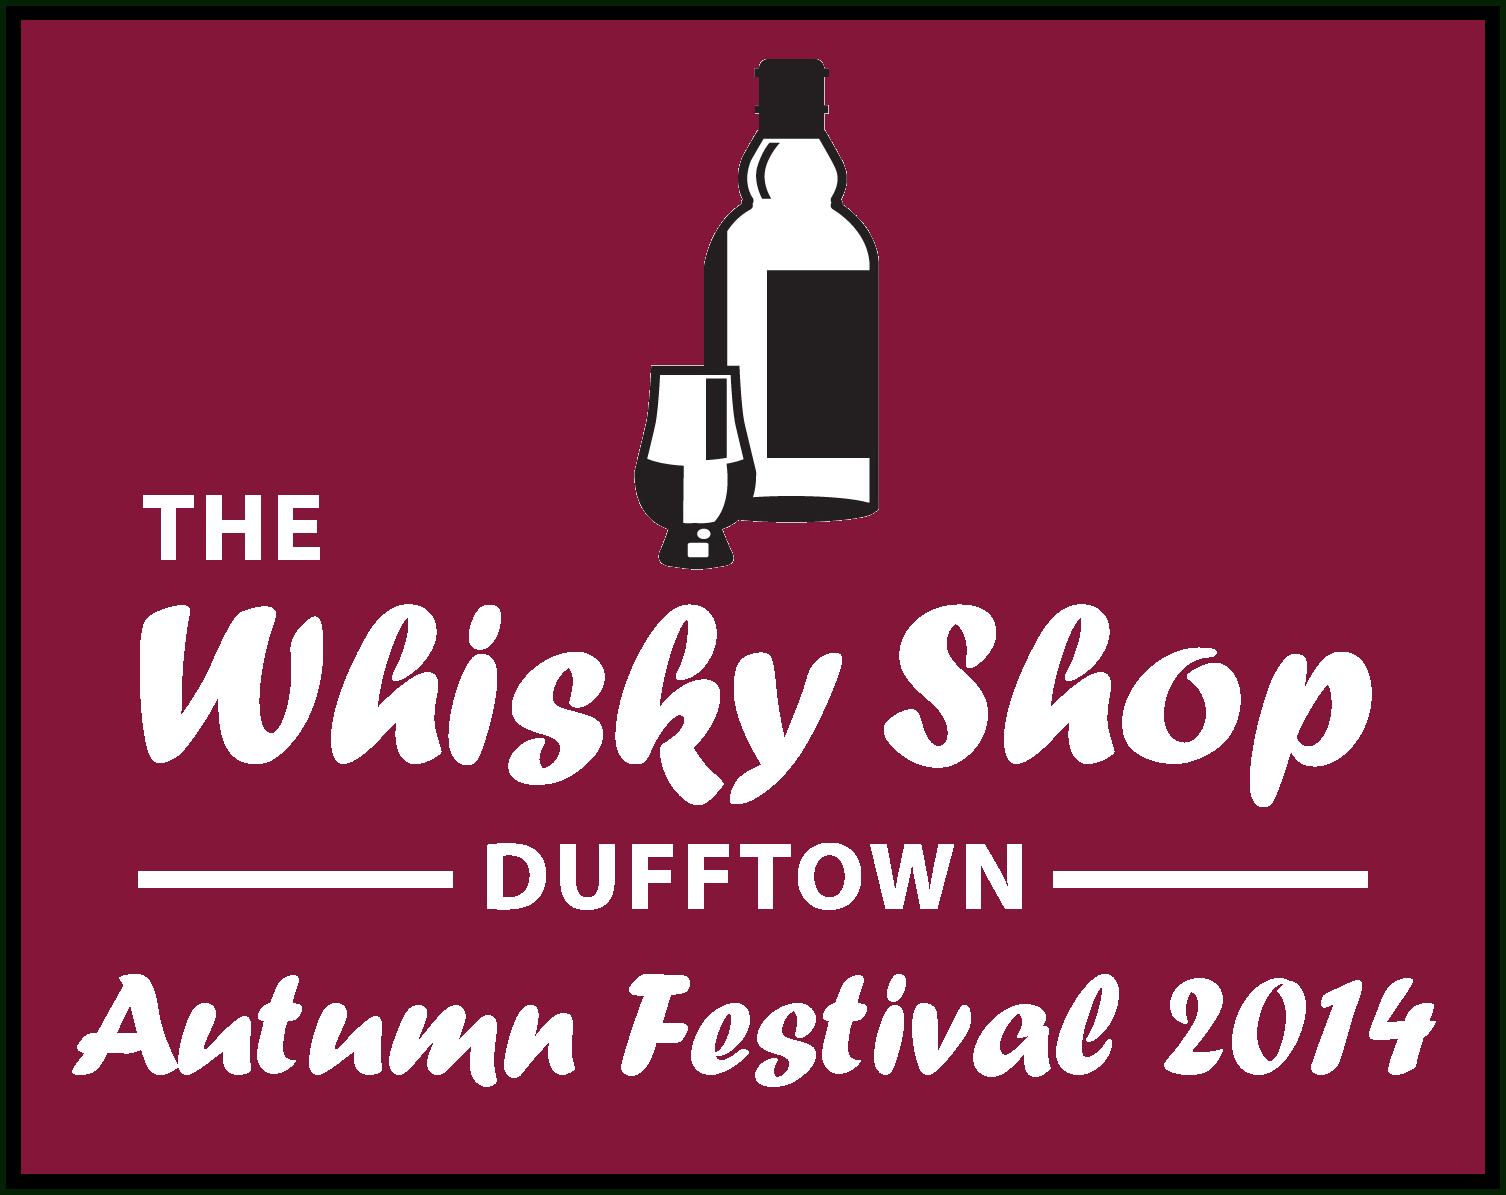 The Whisky Shop Dufftown Autumn Festival 2014